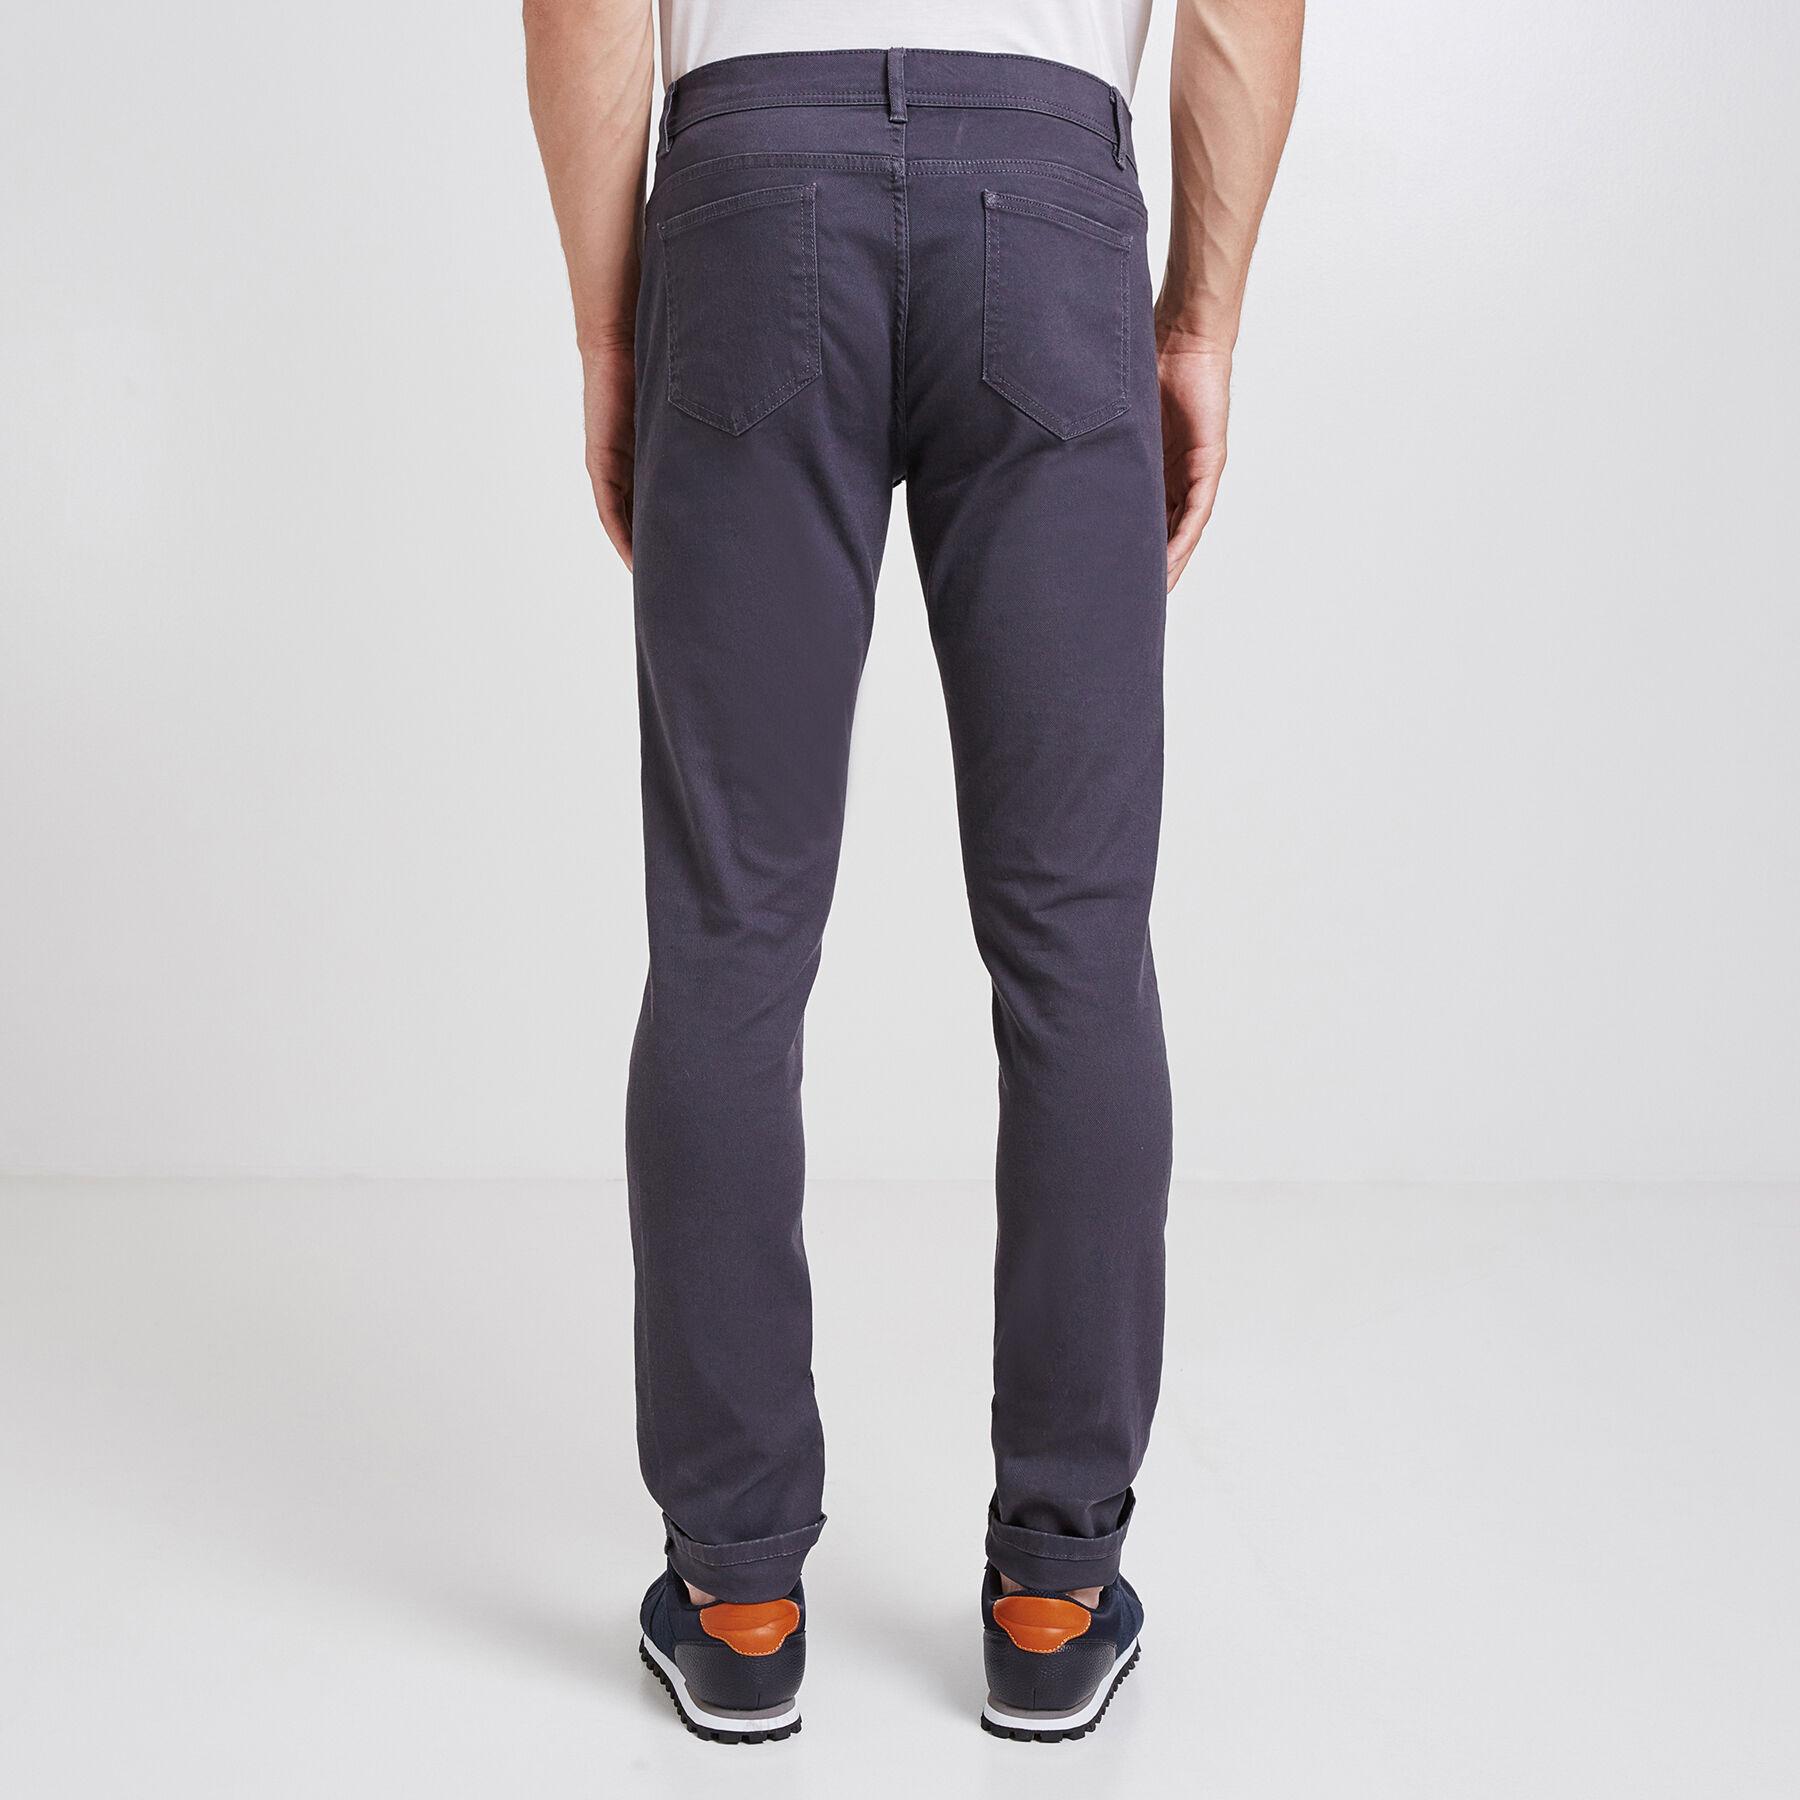 pantalon slim 5 poches gris homme jules. Black Bedroom Furniture Sets. Home Design Ideas